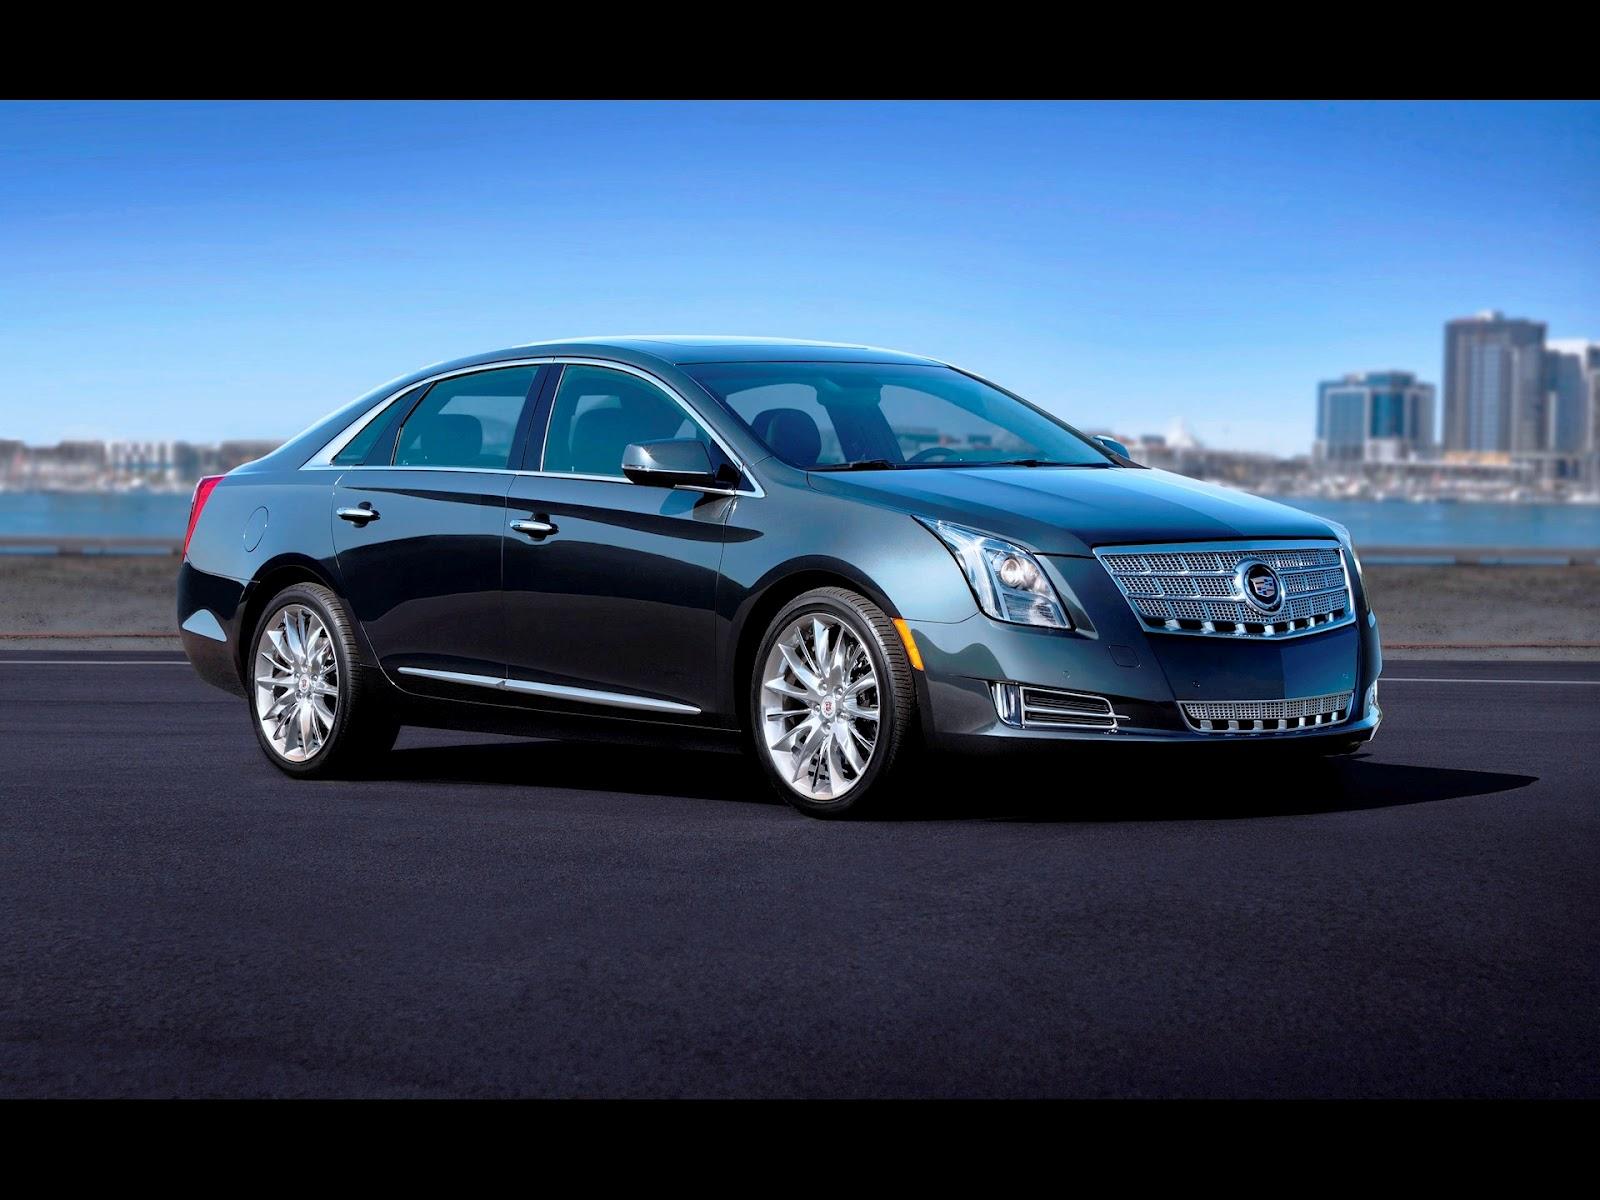 2013 cadillac xts luxury sedan news hot car. Black Bedroom Furniture Sets. Home Design Ideas